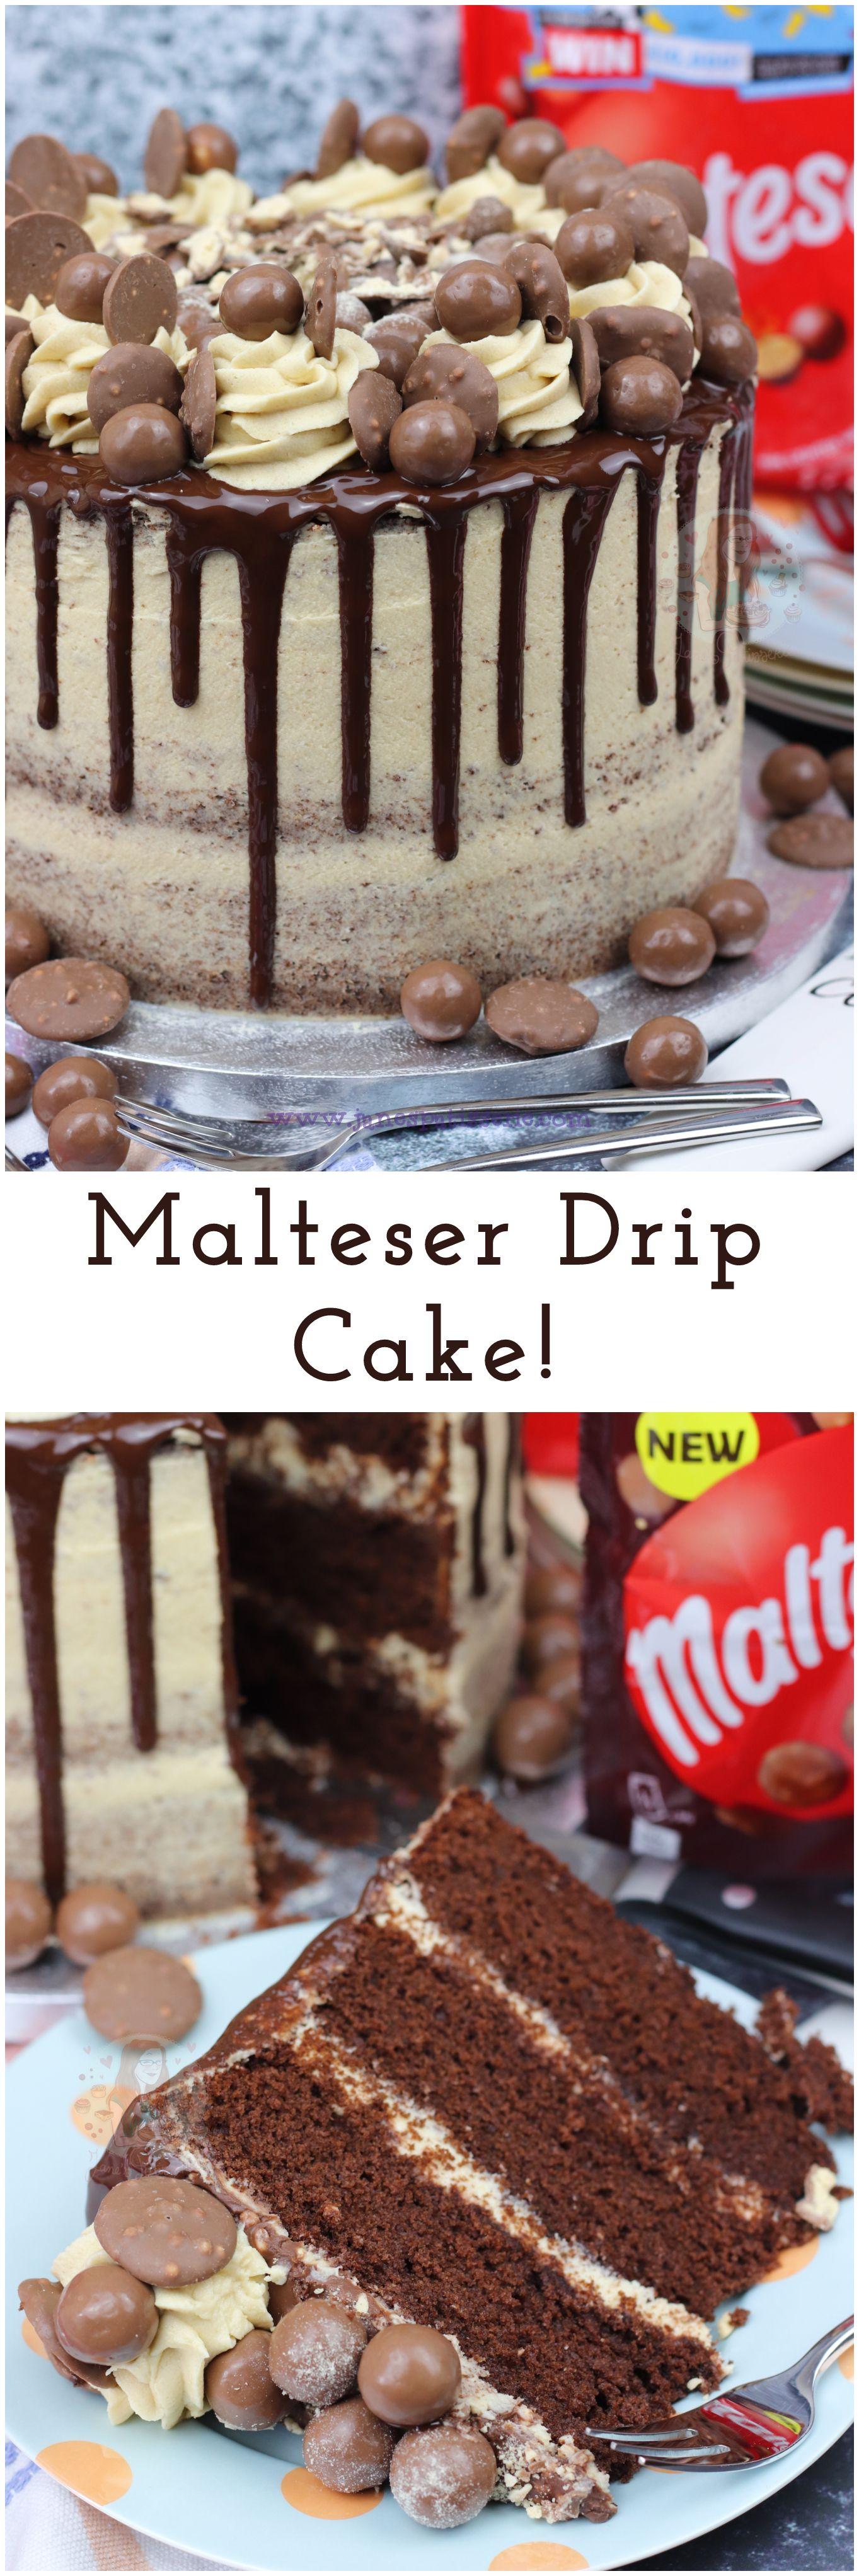 Malteser Drip Cake A Three Layer Malt Chocolate Cake with Malt